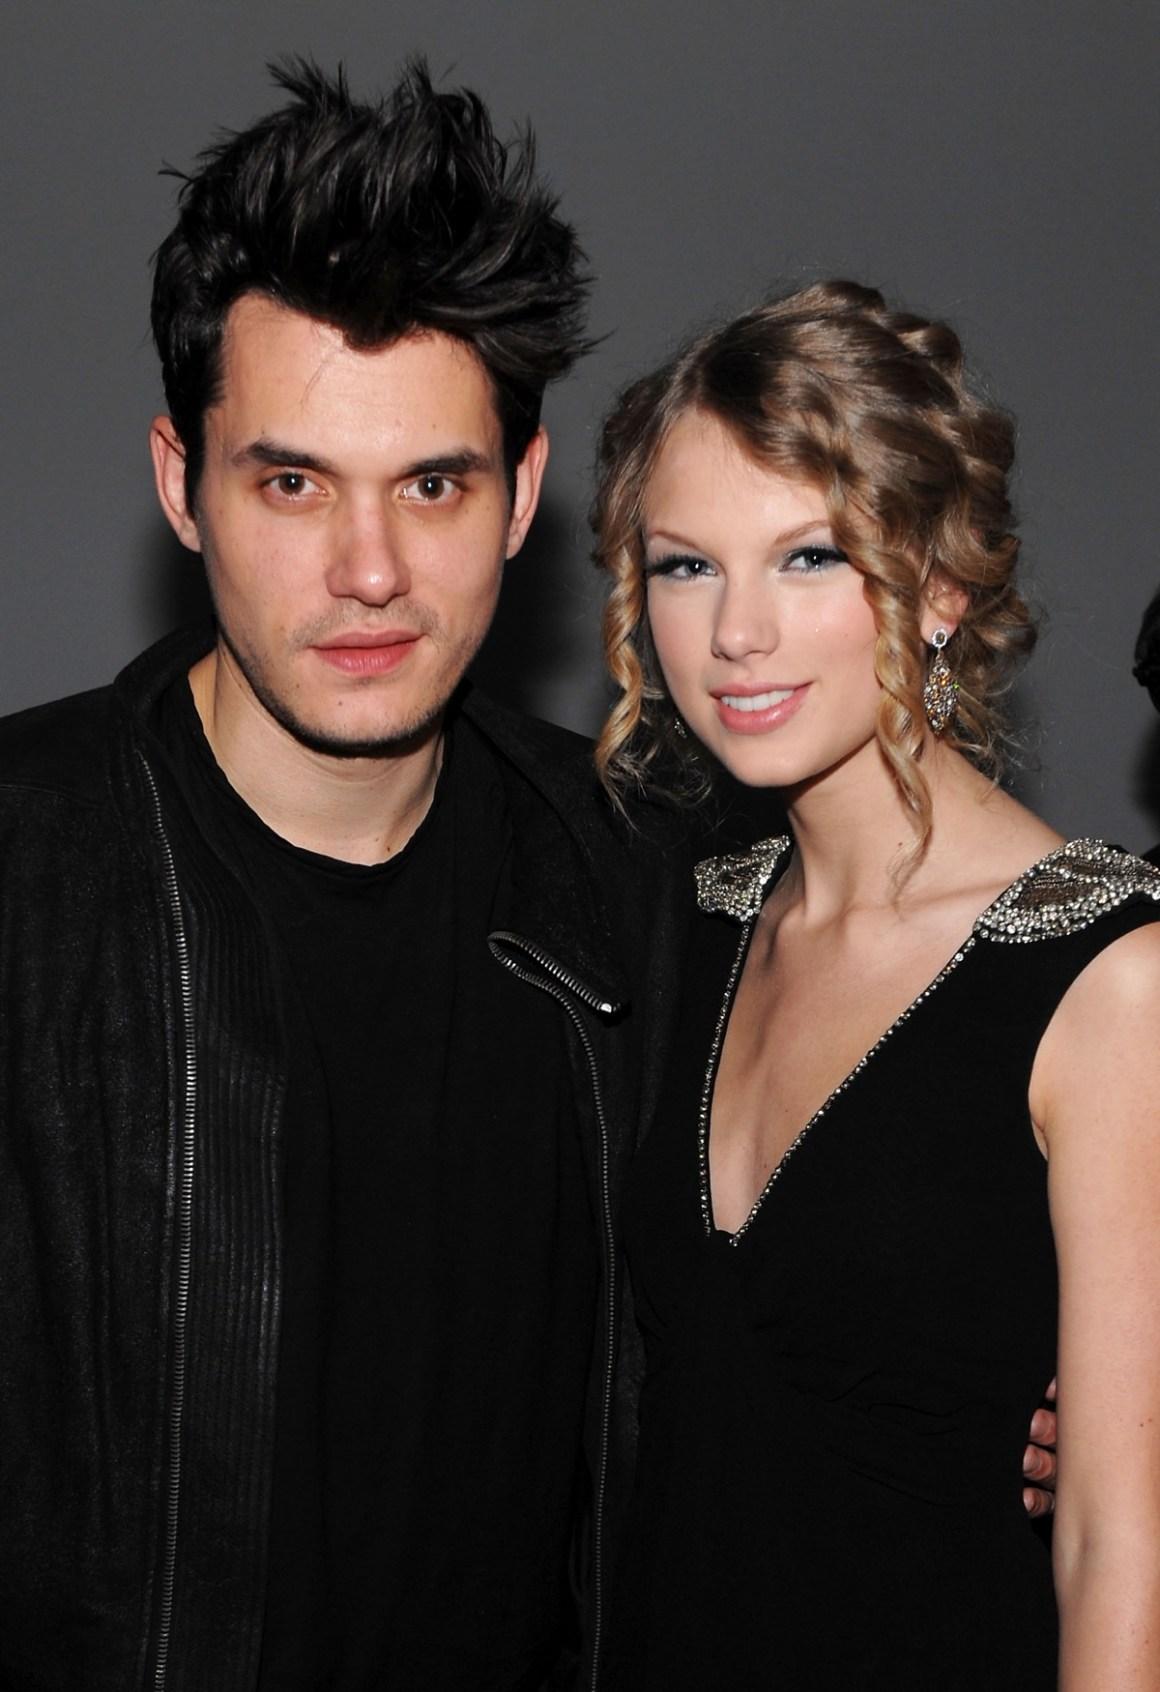 John Mayer and Taylor Swift VEVO Launches Premiere Destination for Premium Music Video - Inside